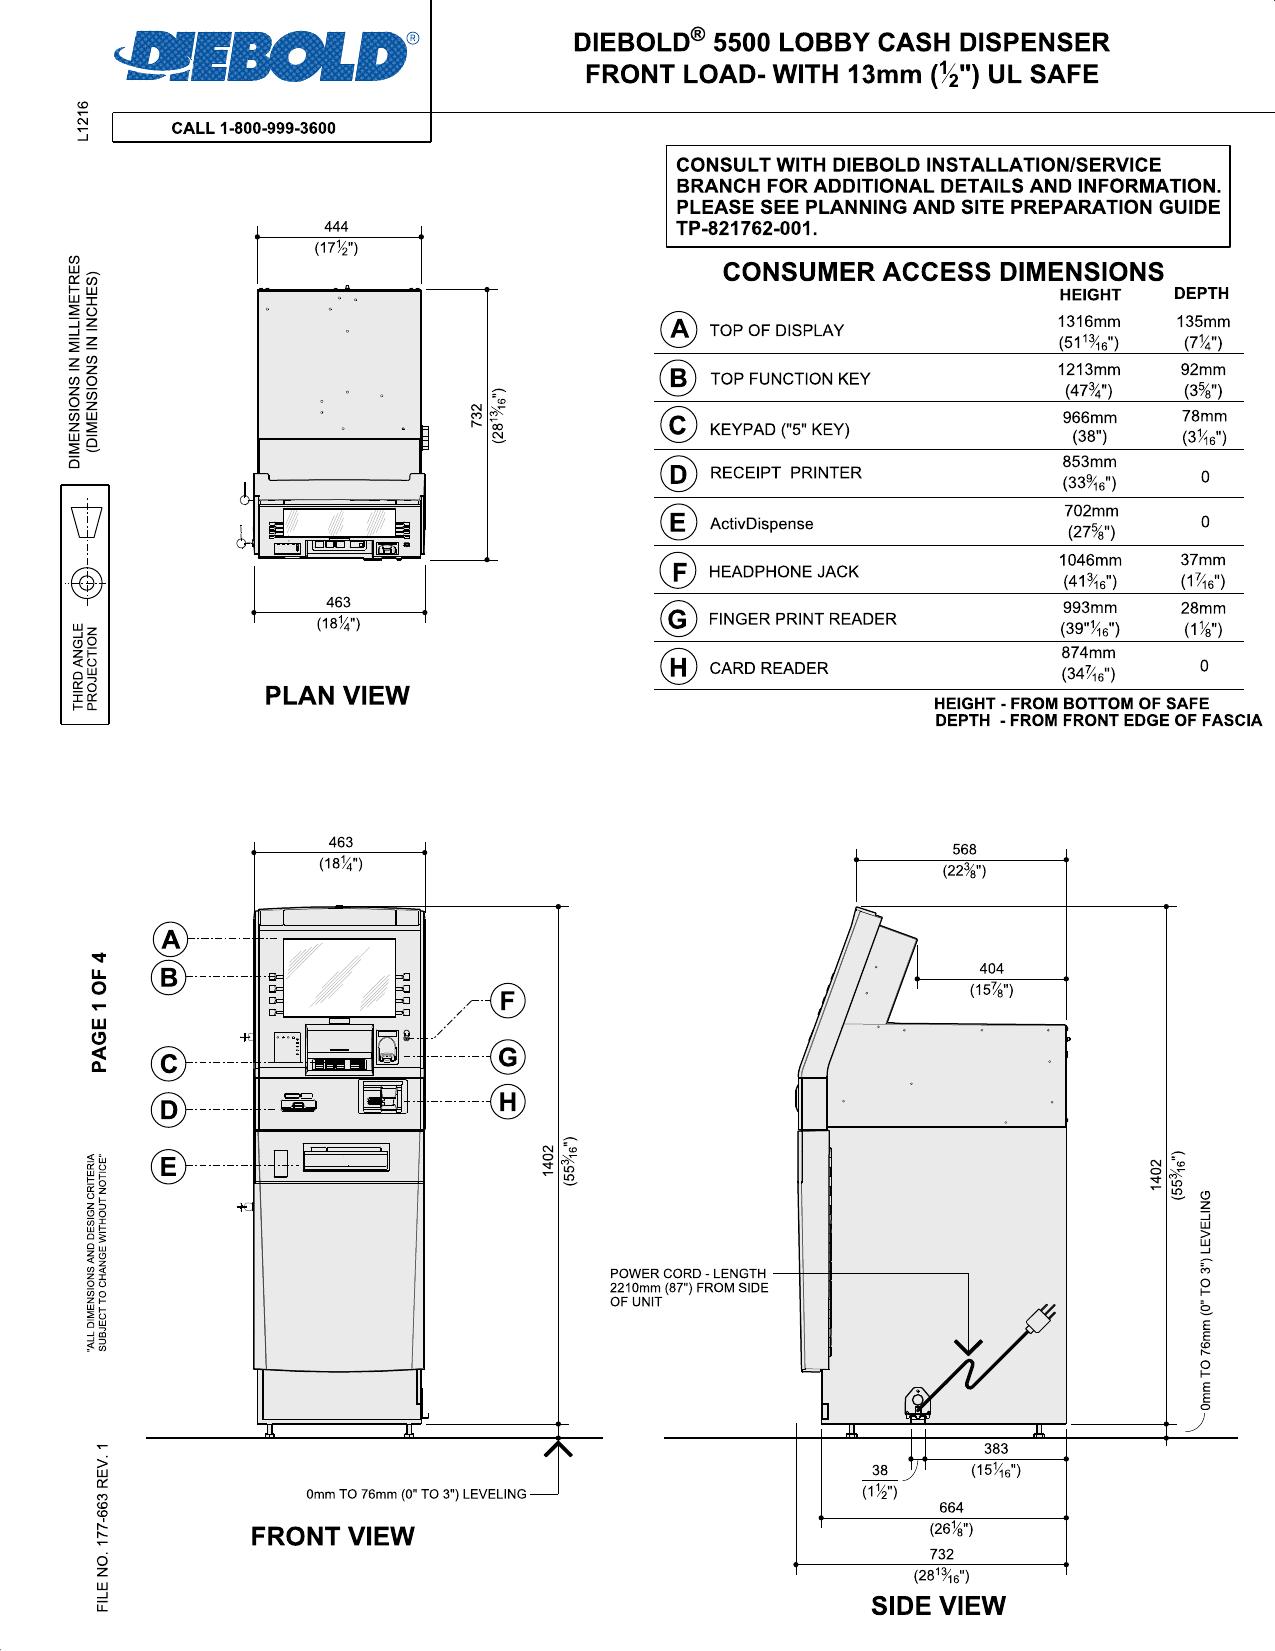 Diebold Lobby Cash Dispenser Front Load With Mm UL - Diebold atm alarm wiring diagram